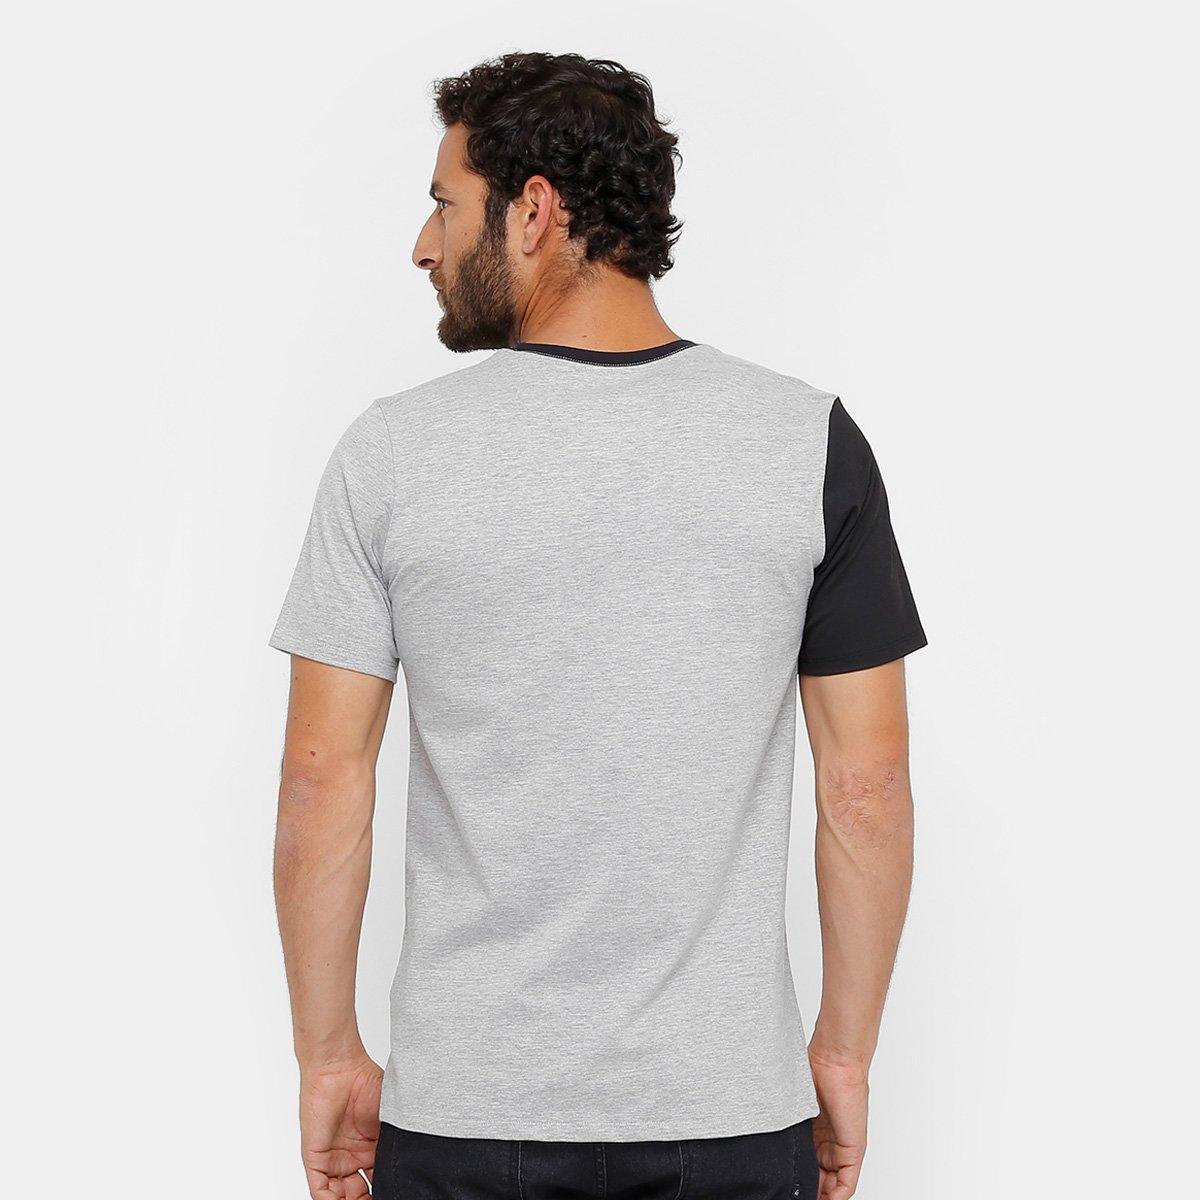 Camiseta Nike Asym Jdi Masculina - Compre Agora  c7a12022b41ef